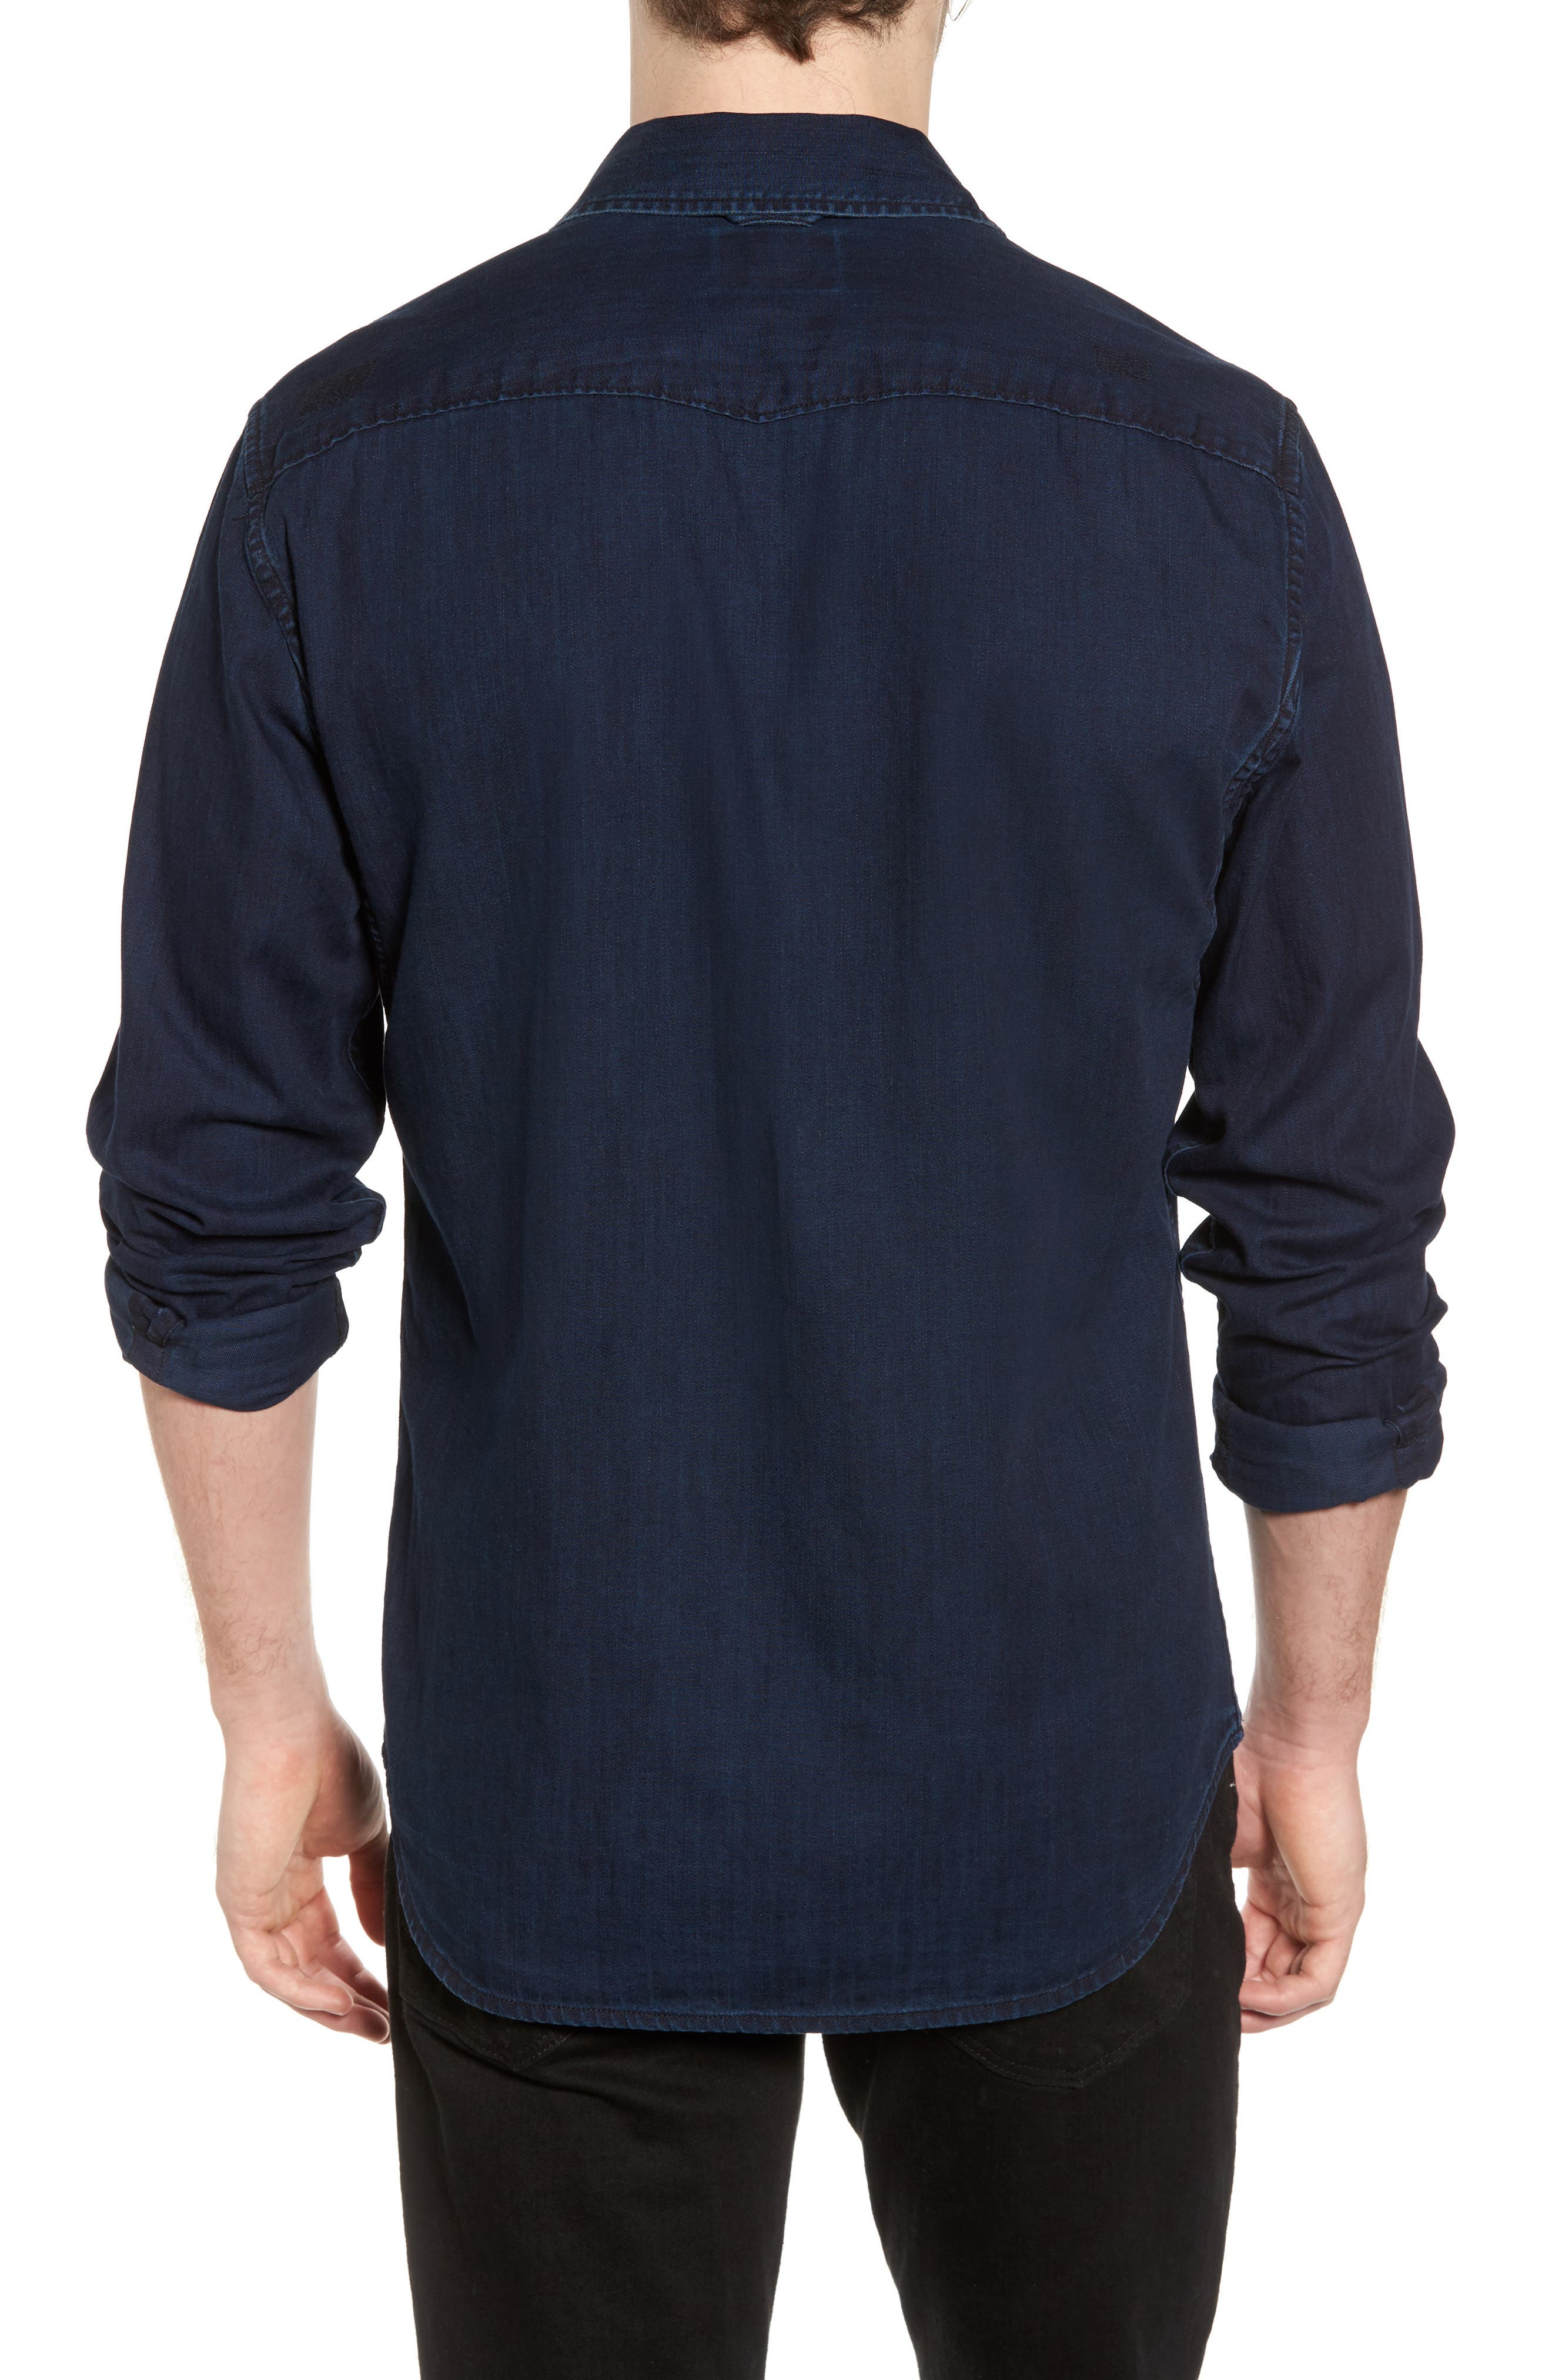 Pocketless Western Denim Shirt,                             Alternate thumbnail 2, color,